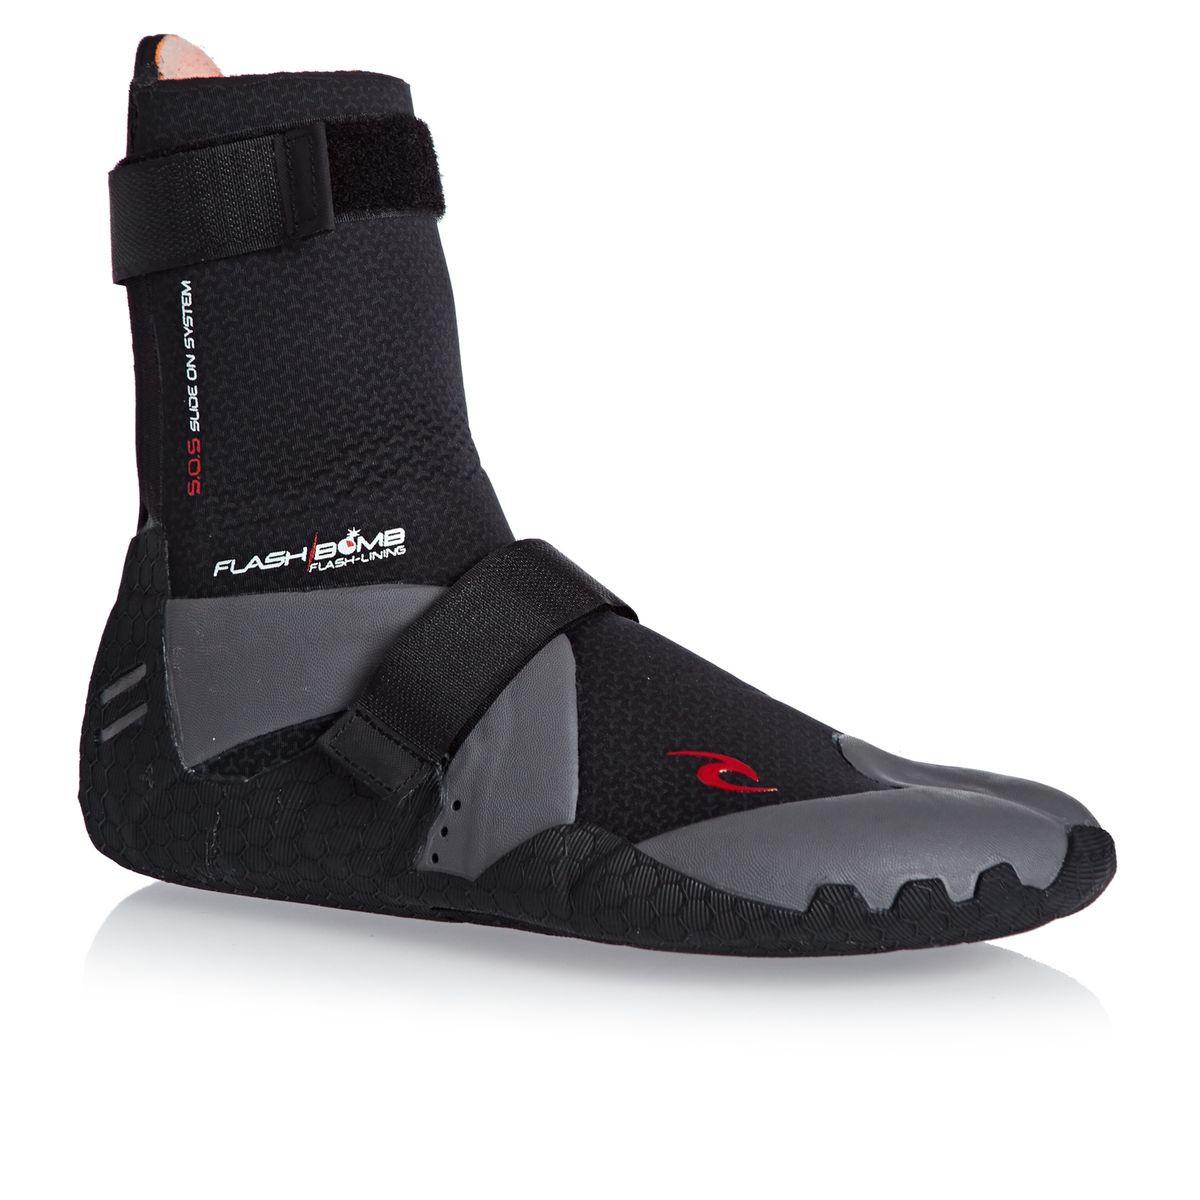 Rip Curl Flashbomb 5mm Hidden Split Toe Wetsuit Boots - Black